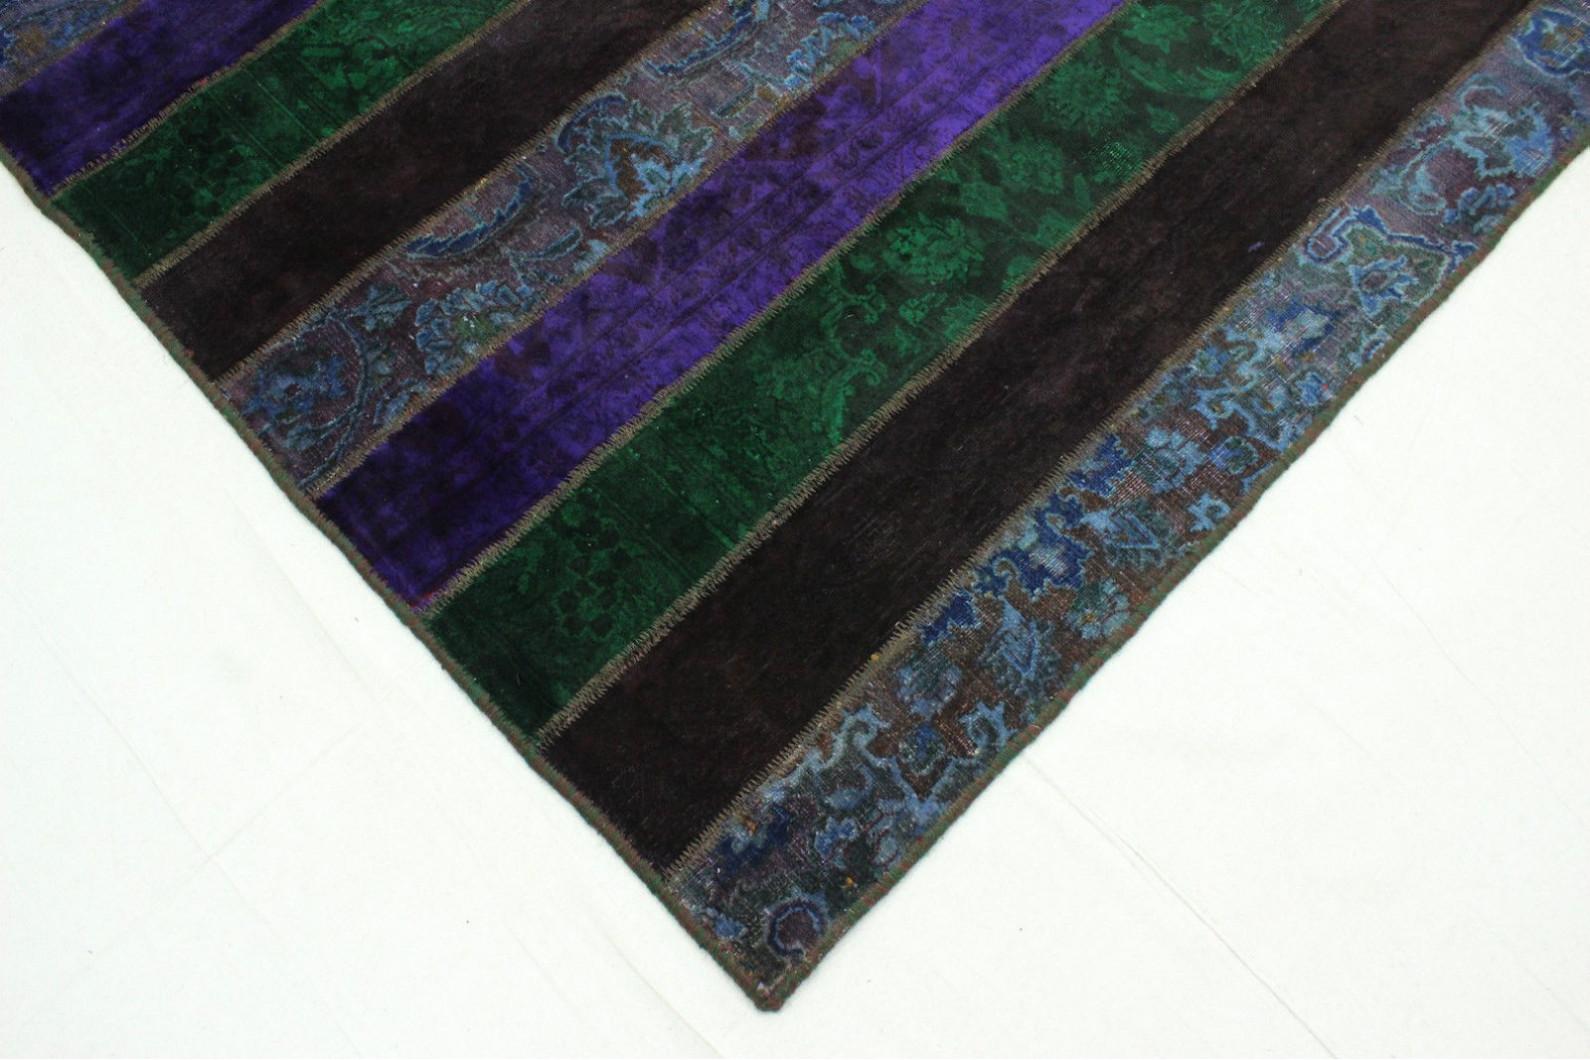 Lila teppich  Patchwork Teppich Grün Lila in 310x200cm (1001-1885) bei carpetido ...